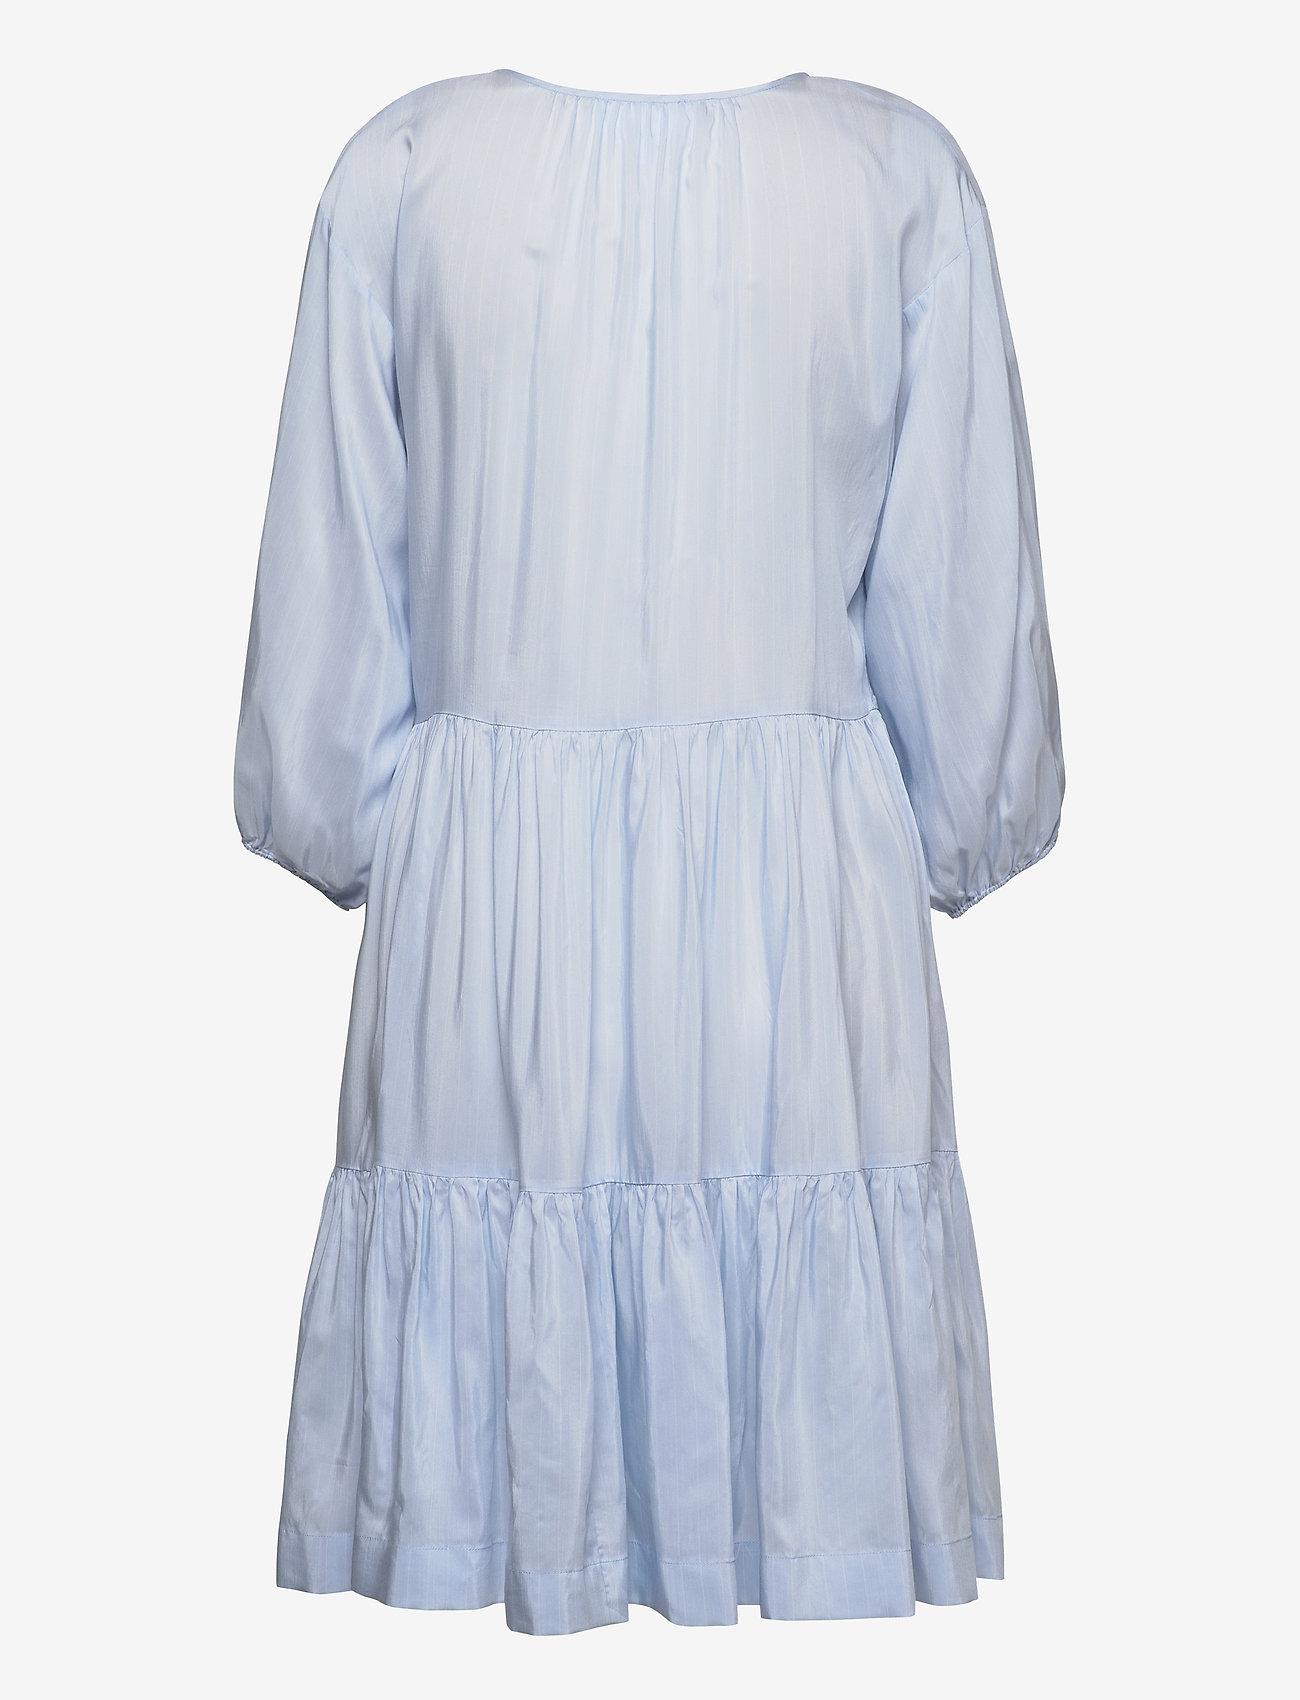 Voluminous Wrap Dress (Light Blue) (153 €) - DESIGNERS REMIX NZ1C8Xp3